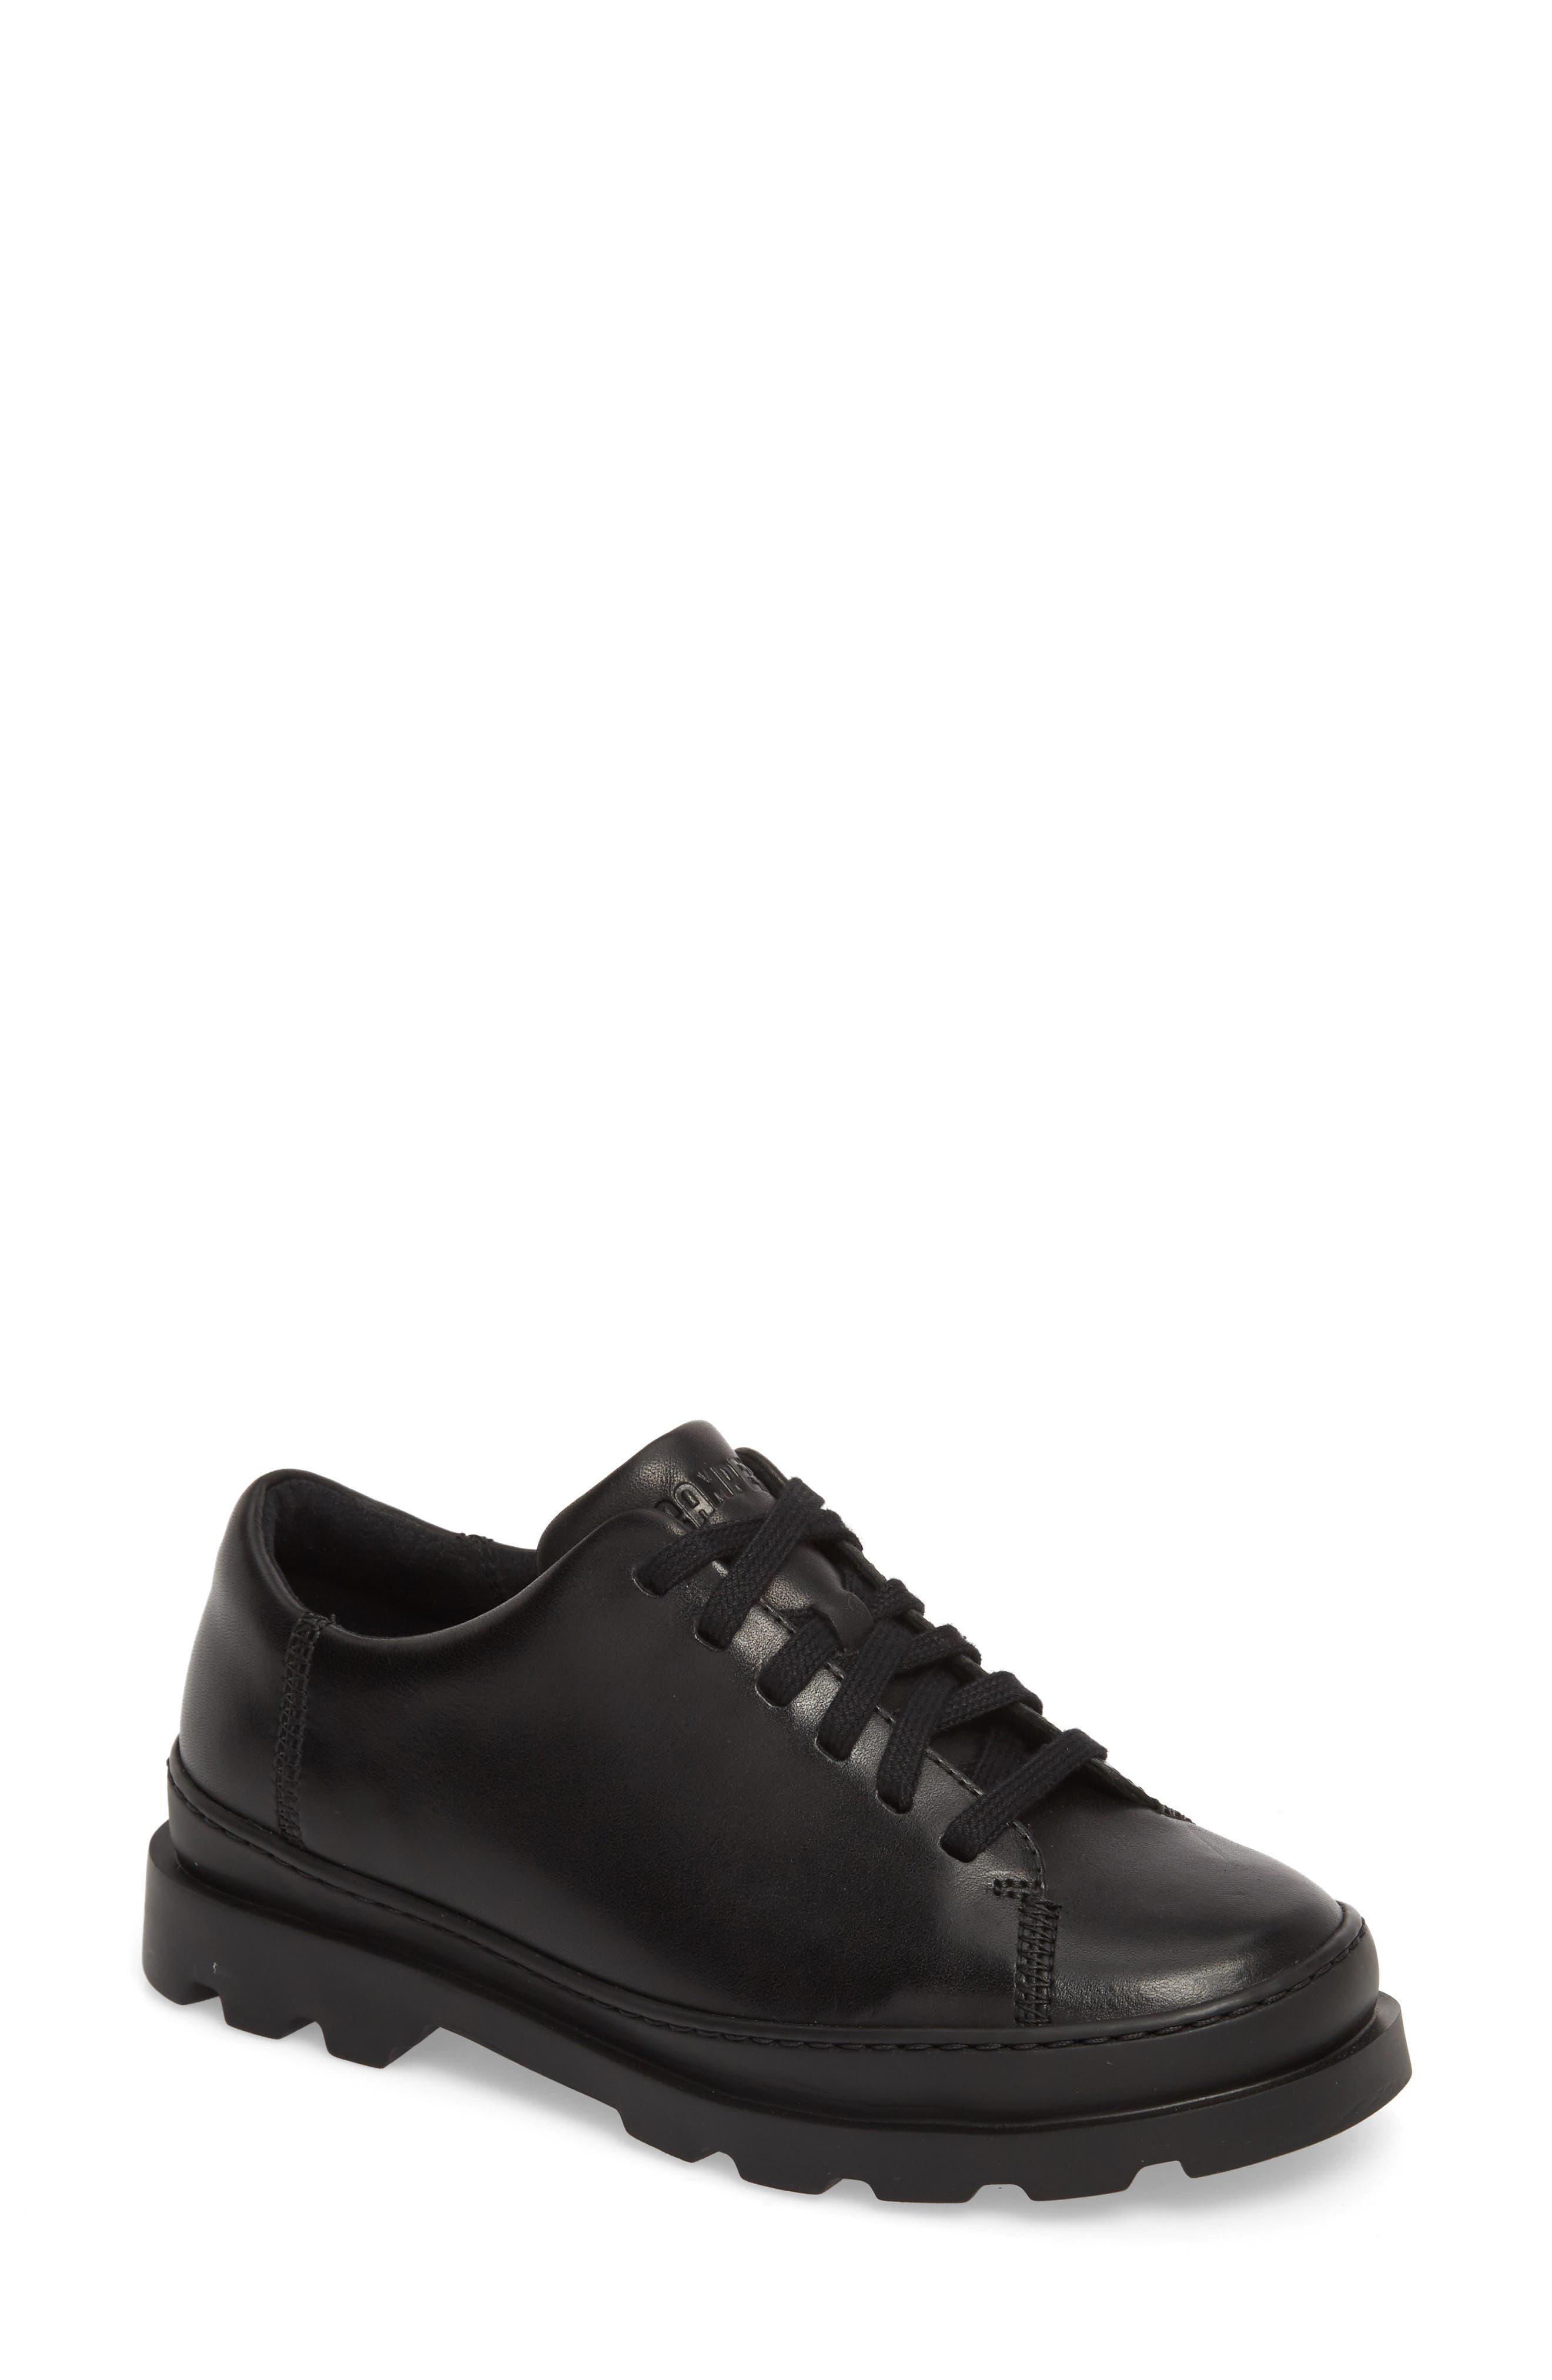 Brutus Sneaker,                         Main,                         color, BLACK LEATHER